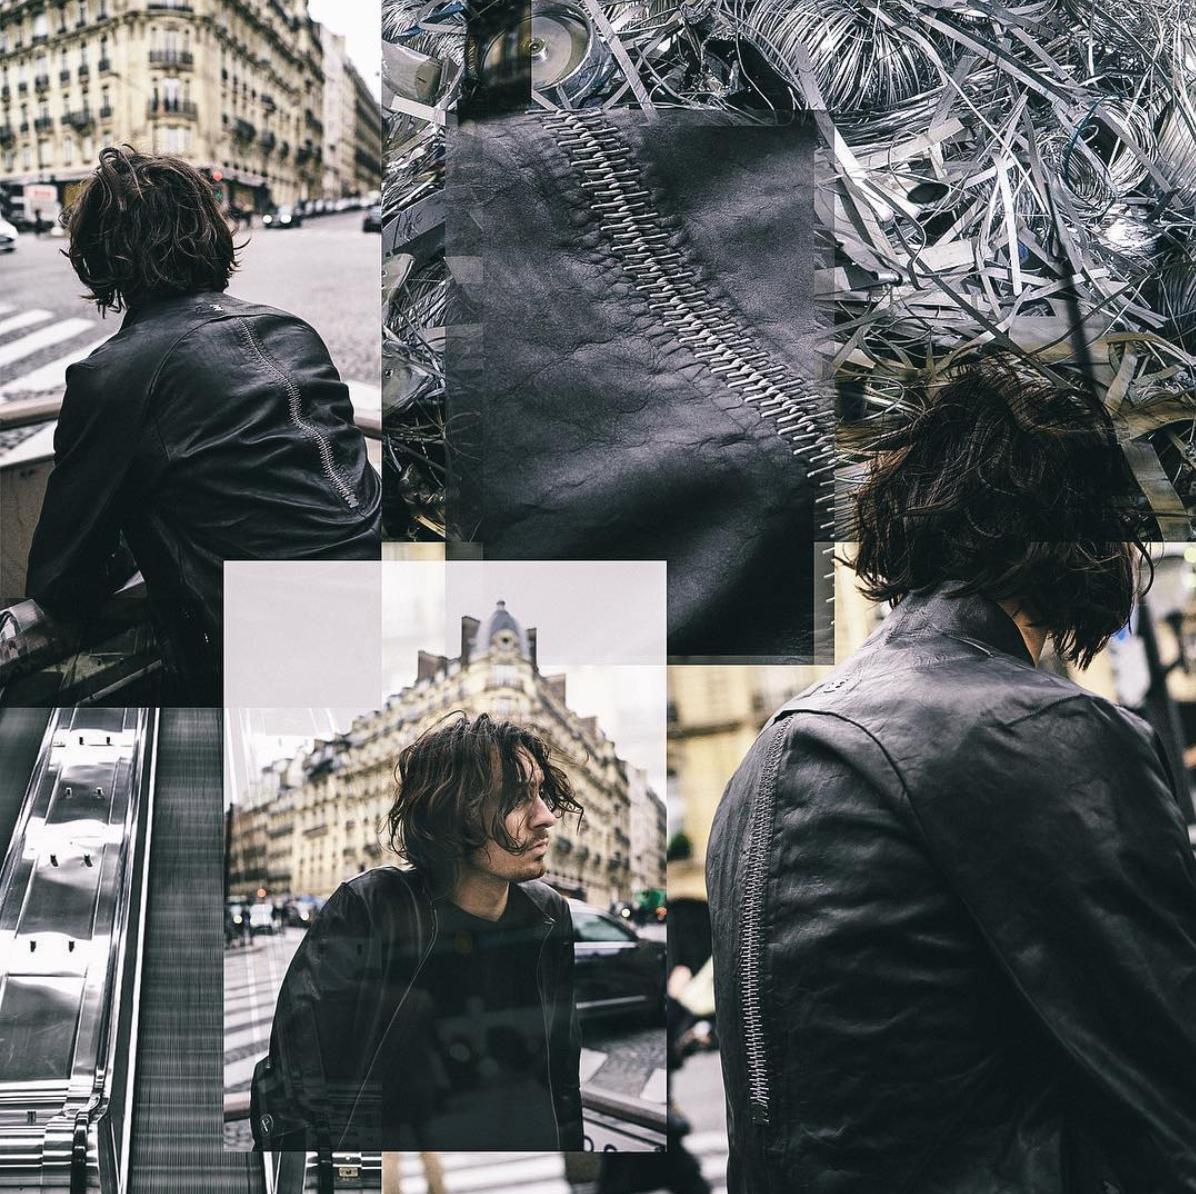 Photoshoot / Isaac Sellam (Artistic direction + Editing)